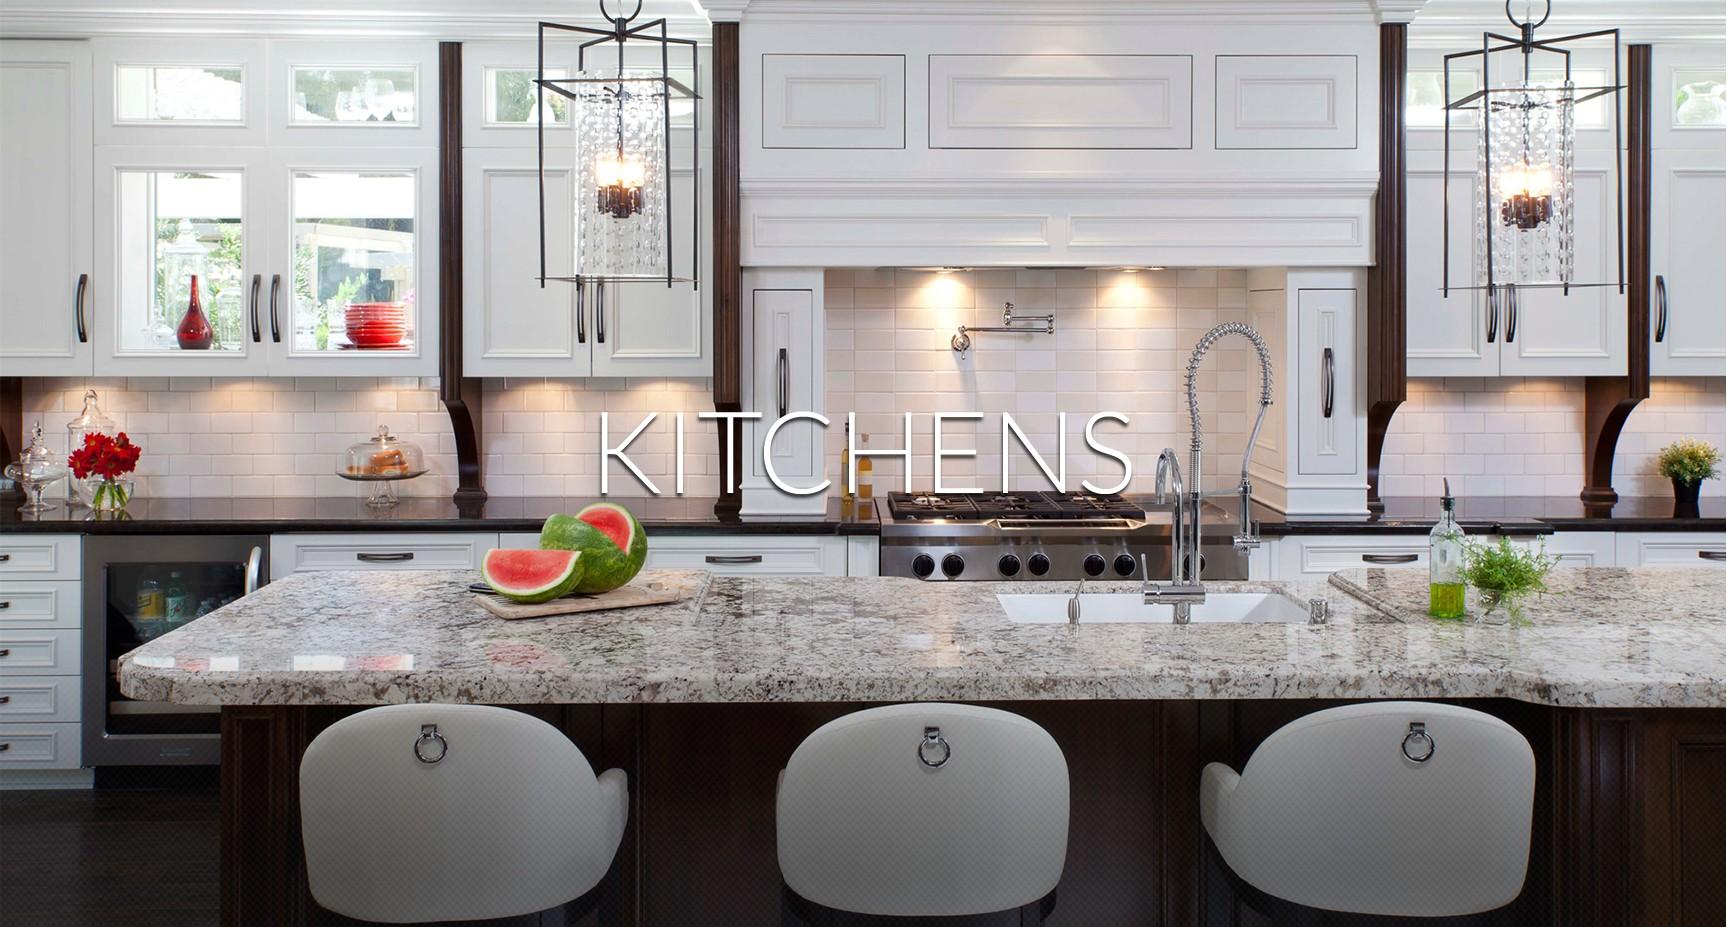 Kitchens Remodel  San Diego Interior Designers